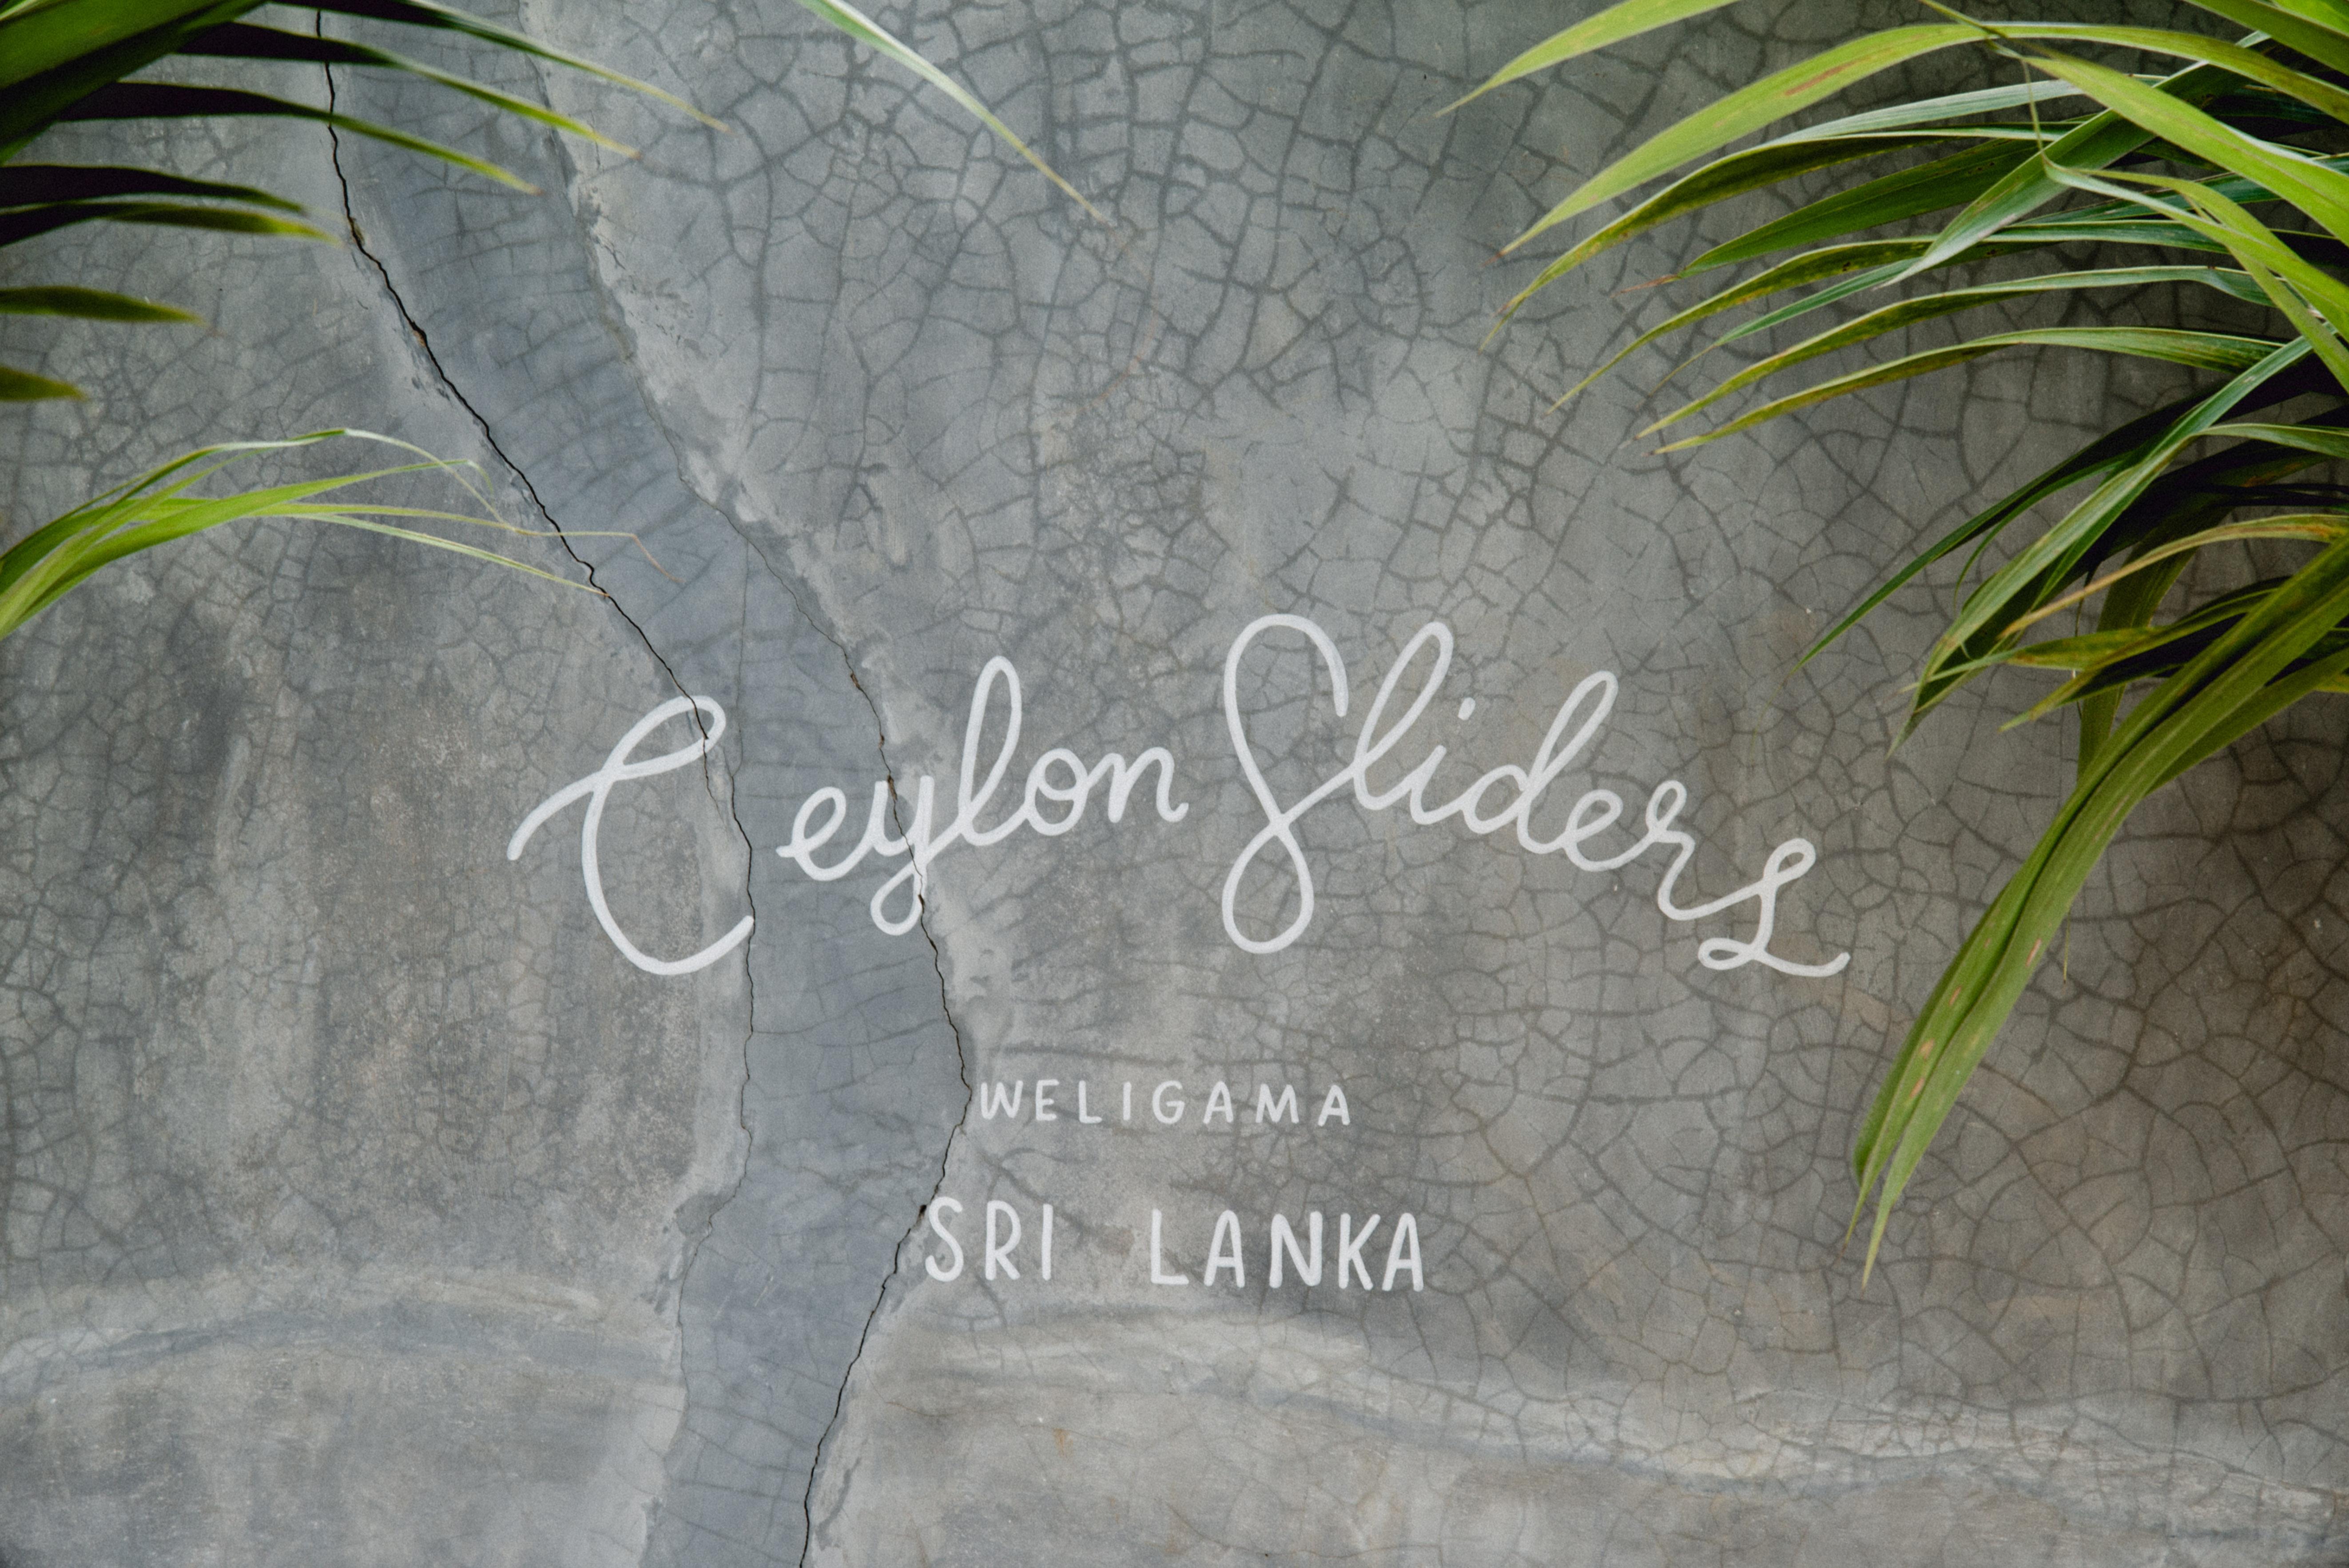 café Ceylon sliders,